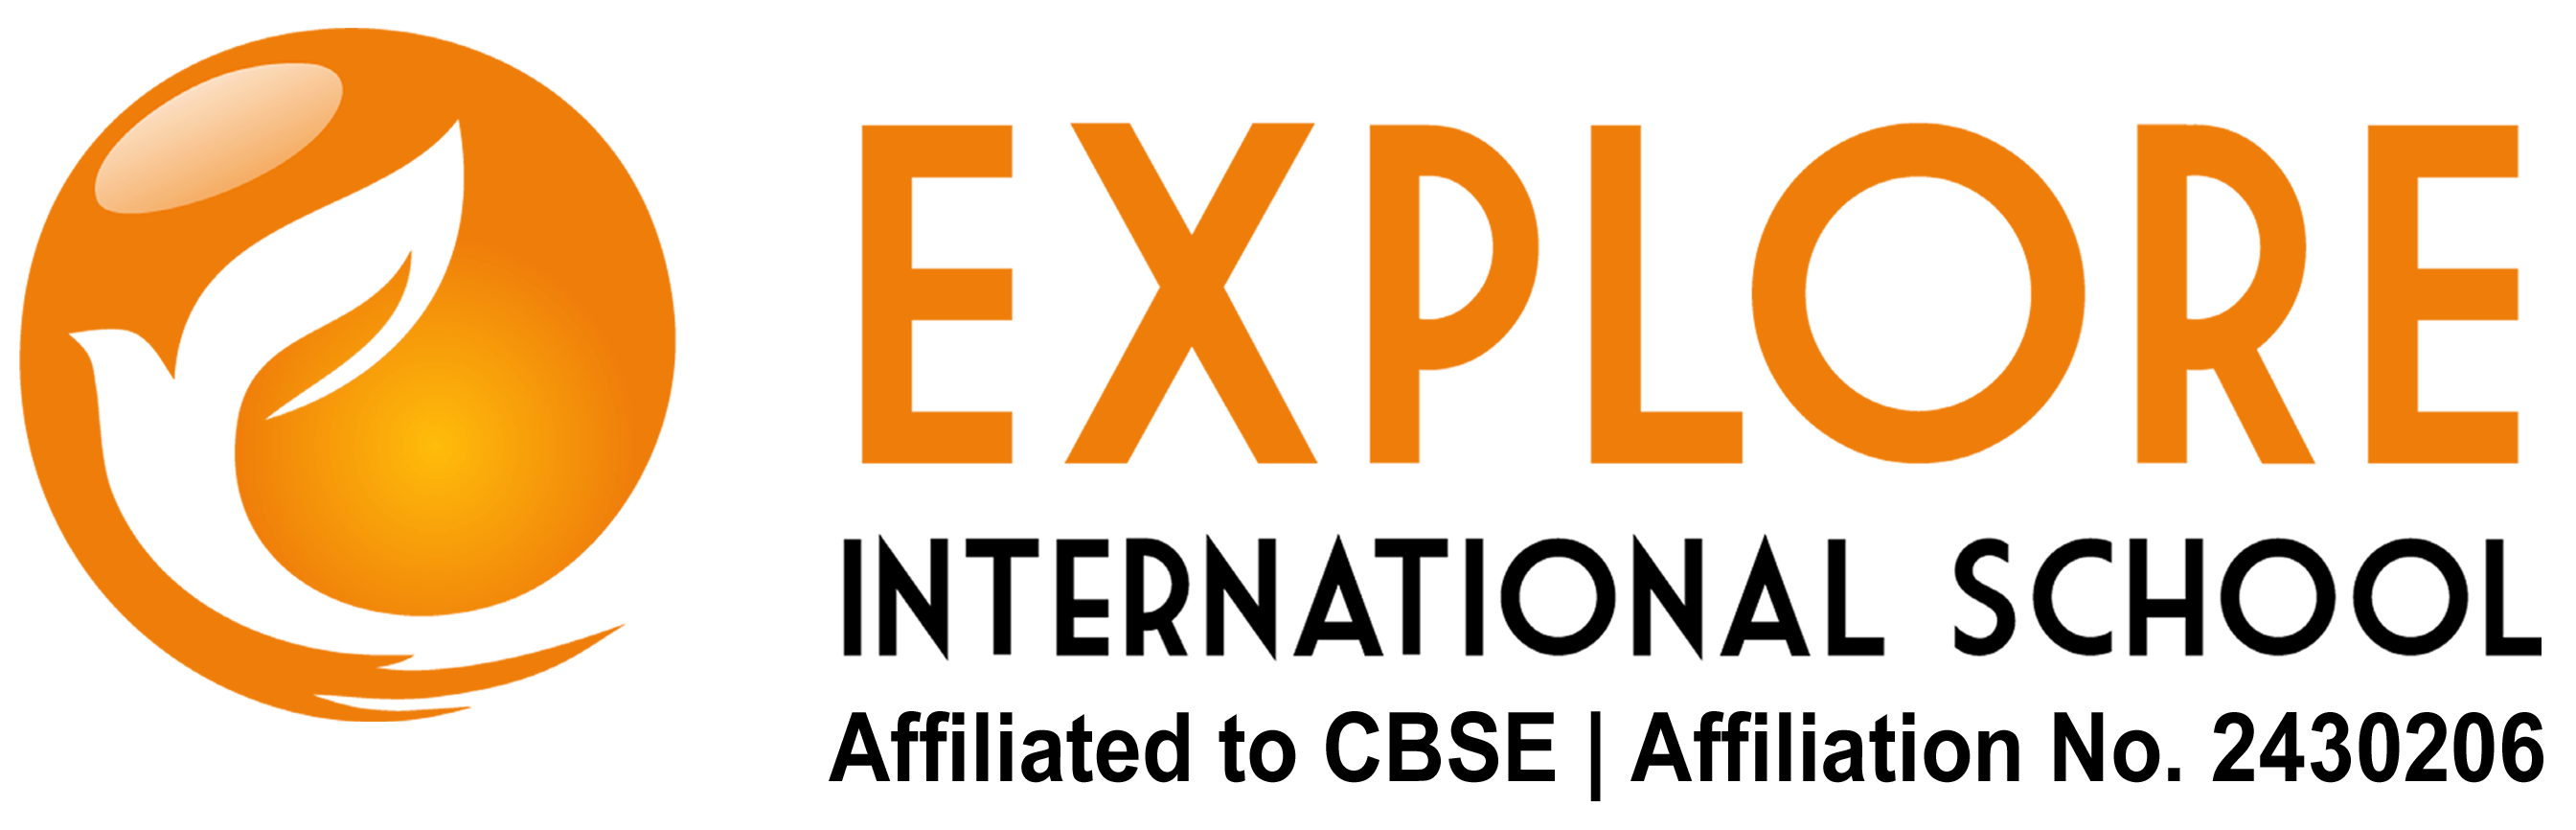 Explore International School